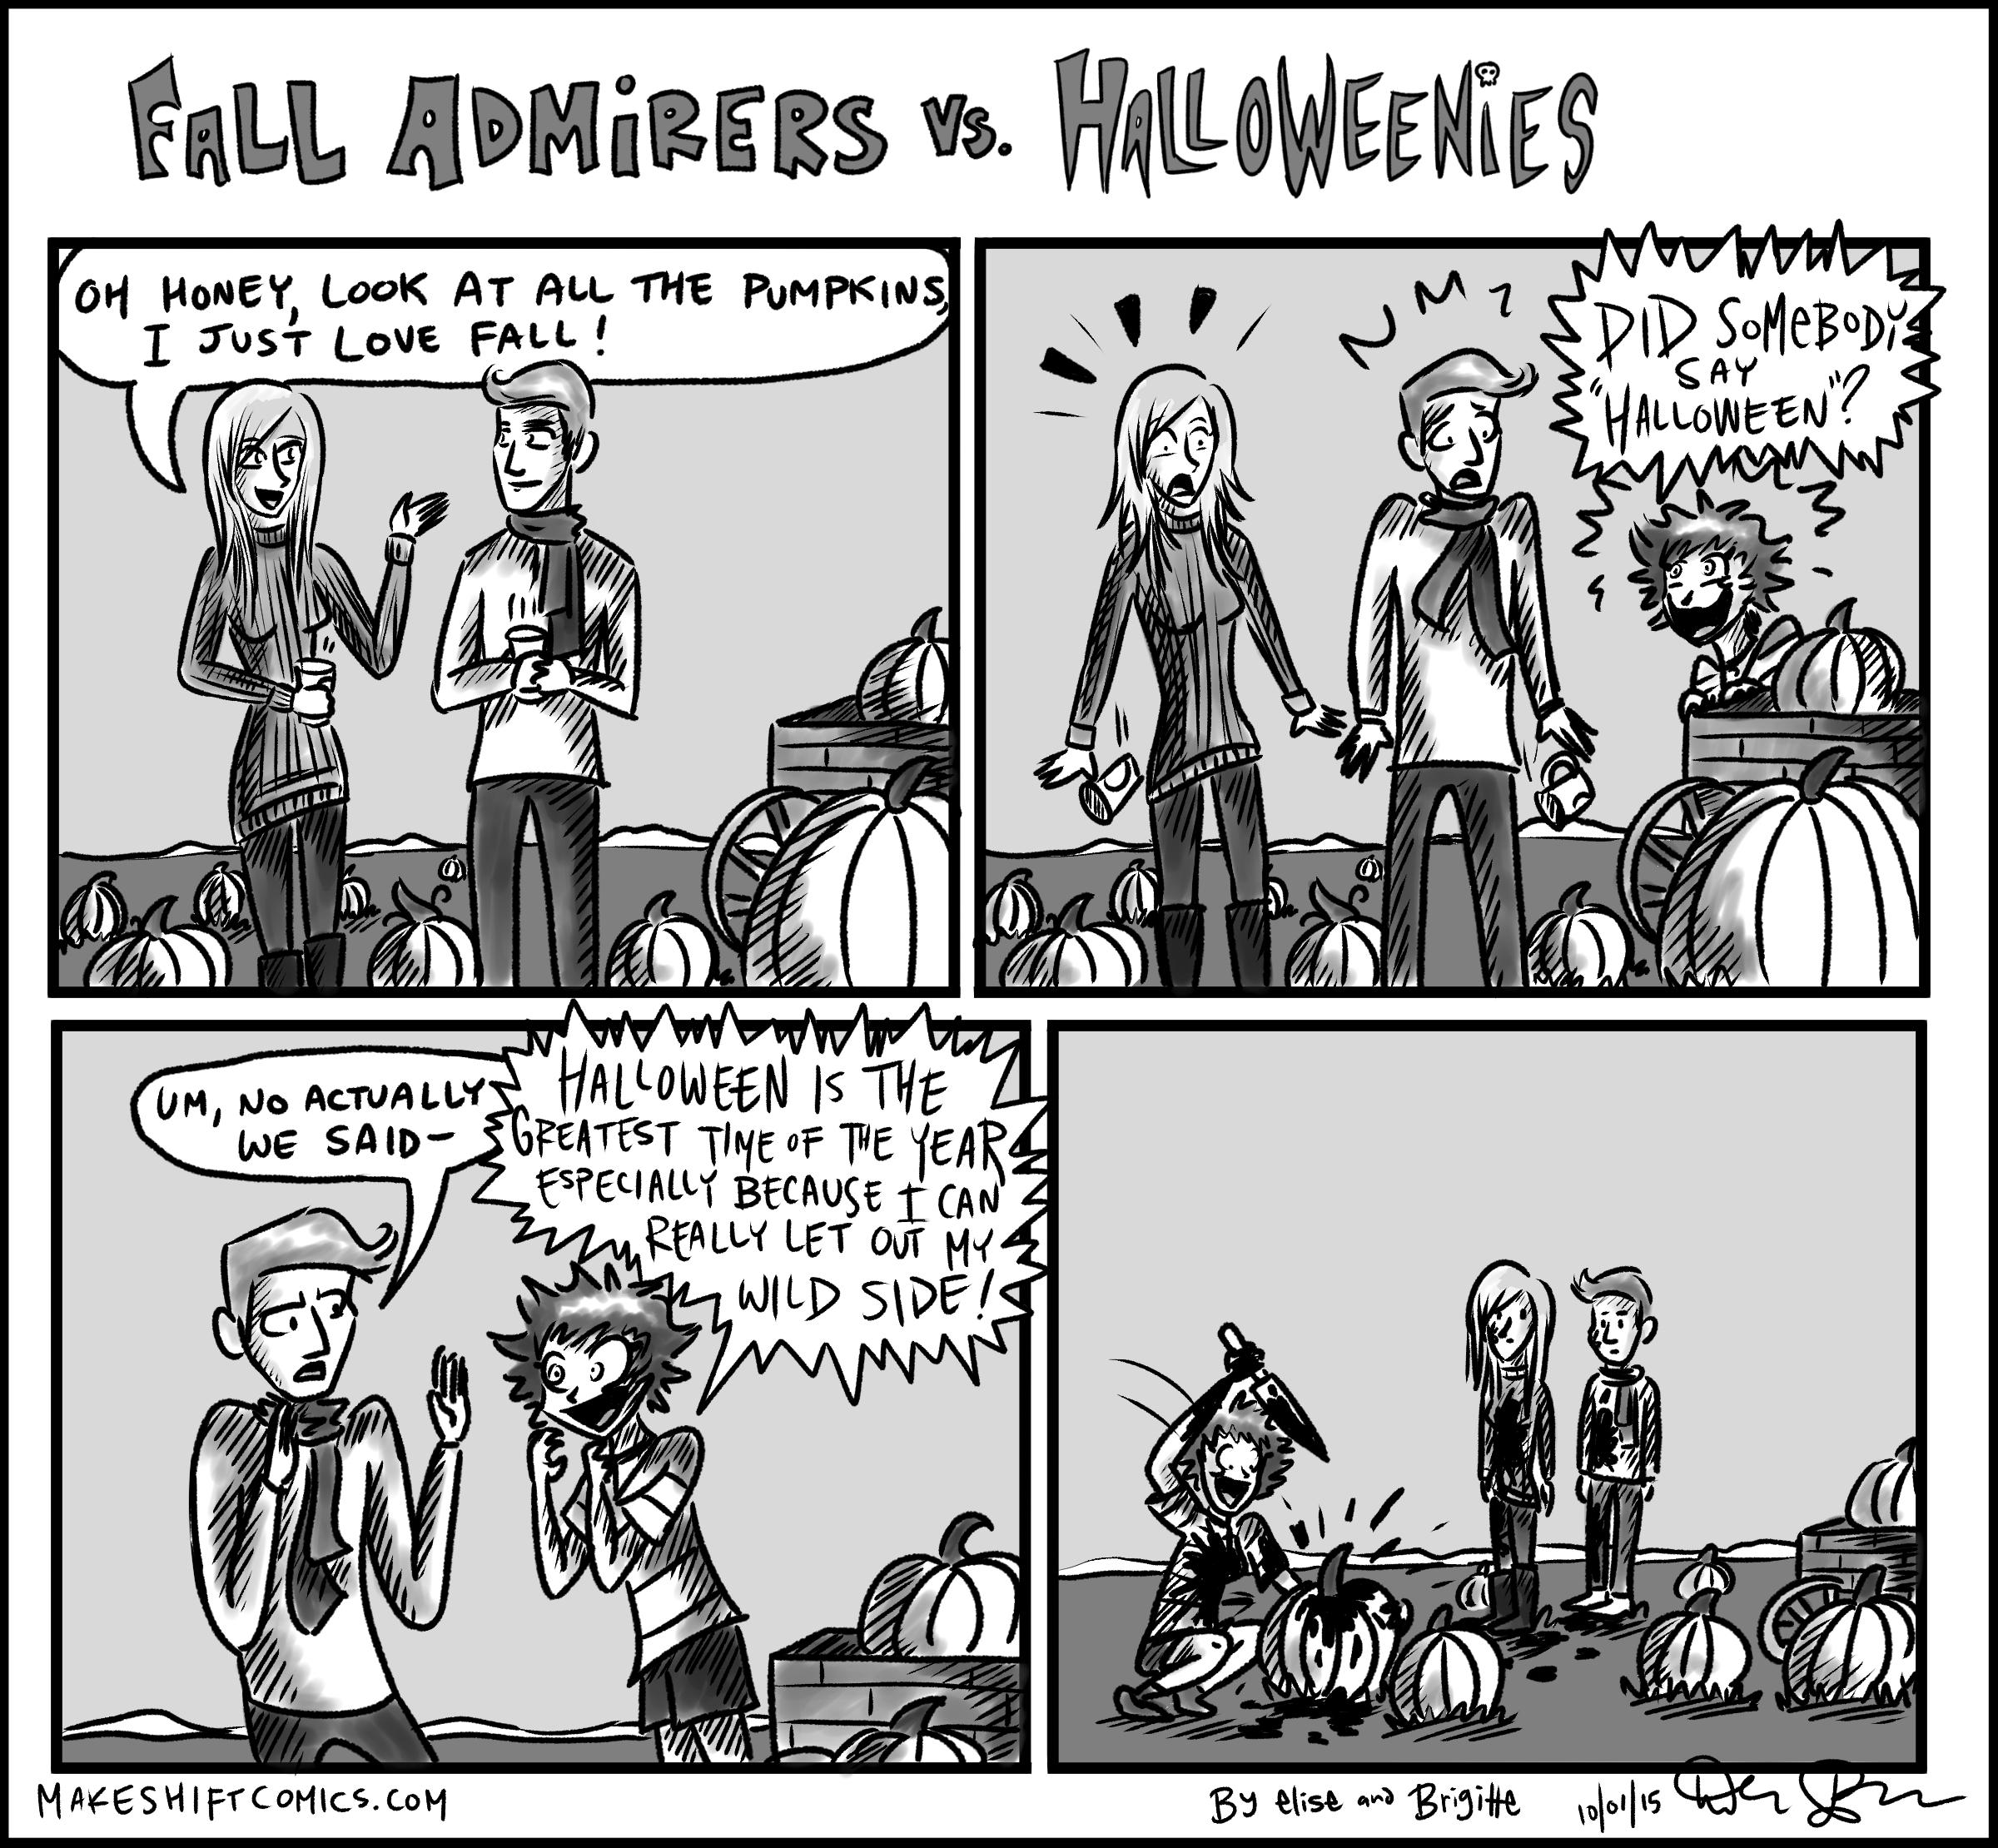 Fall Admirers vs. Halloweenies